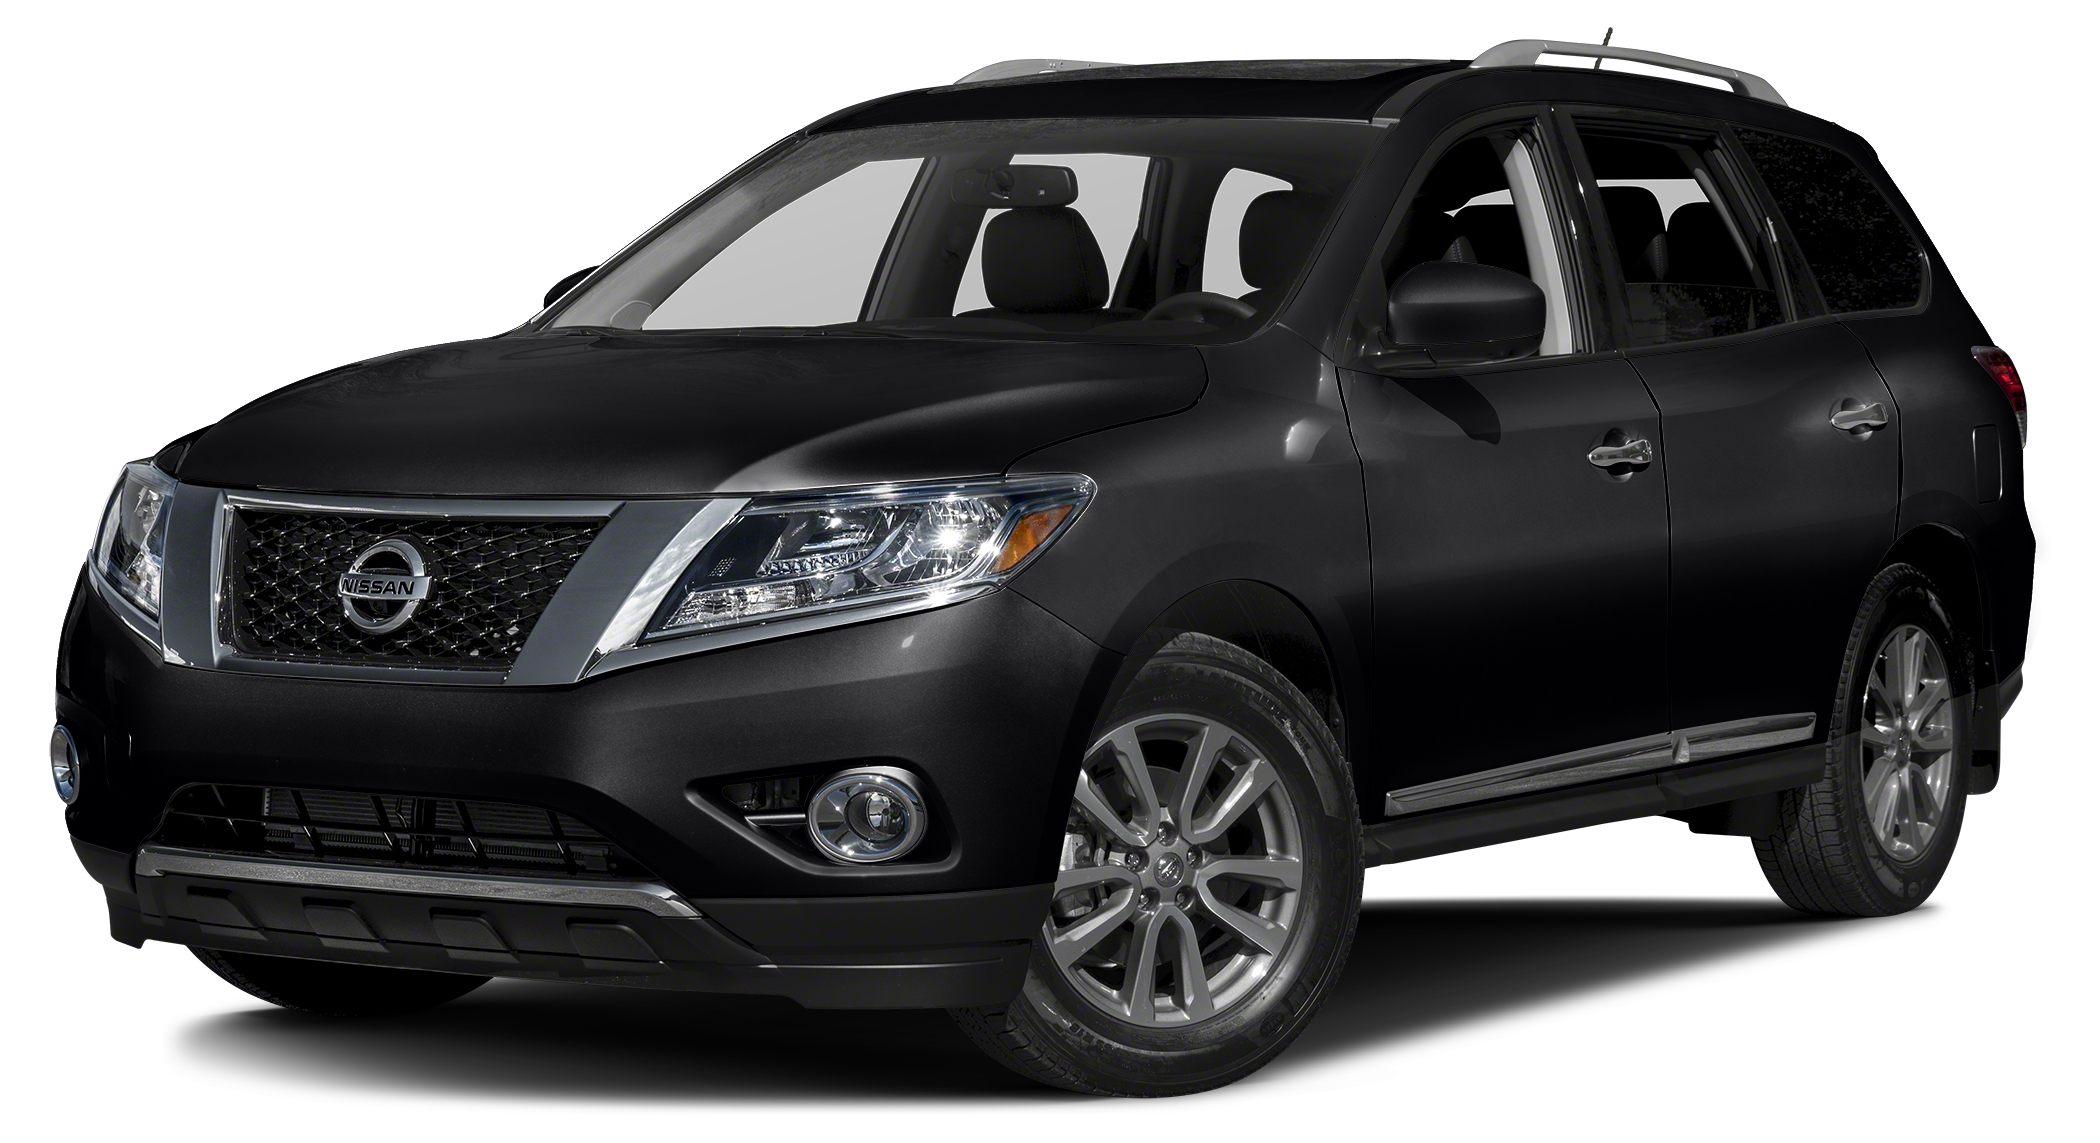 2016 Nissan Pathfinder SL Miles 10Color Magnetic Black Metallic Stock 16P155 VIN 5N1AR2MN5GC